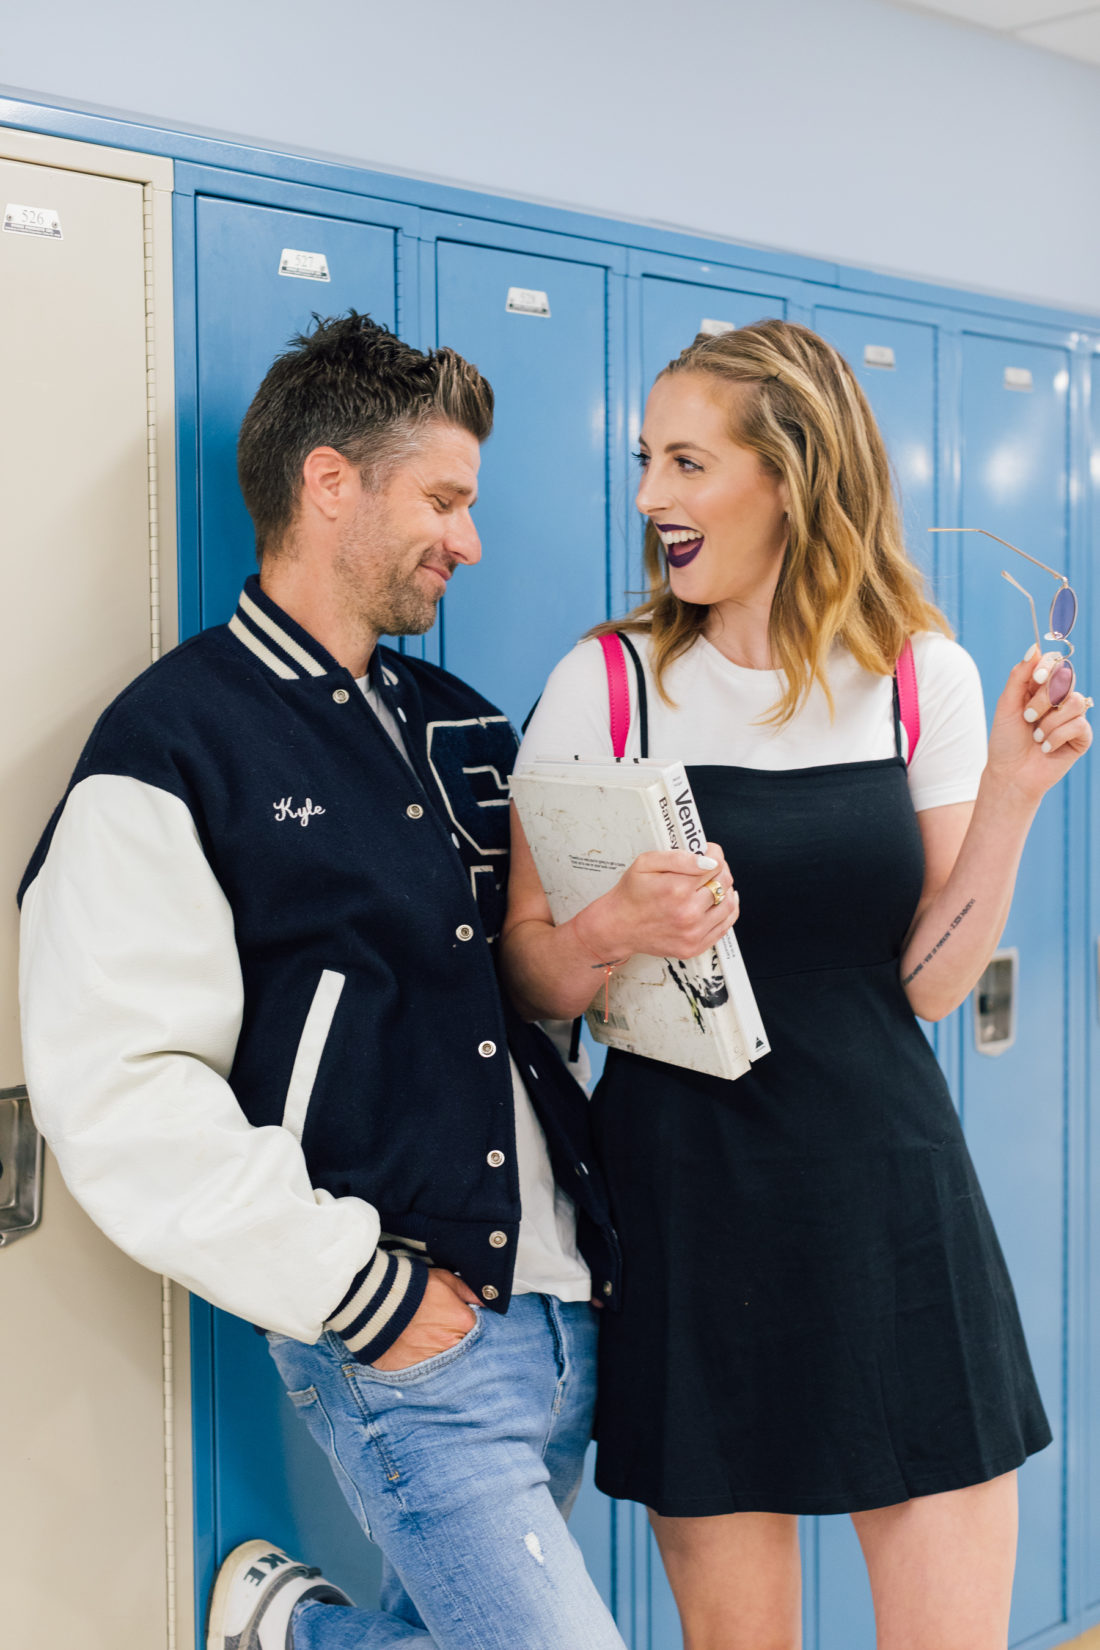 Eva Amurri Martino and husband Kyle wear 90's gear and walk through the halls of his high school